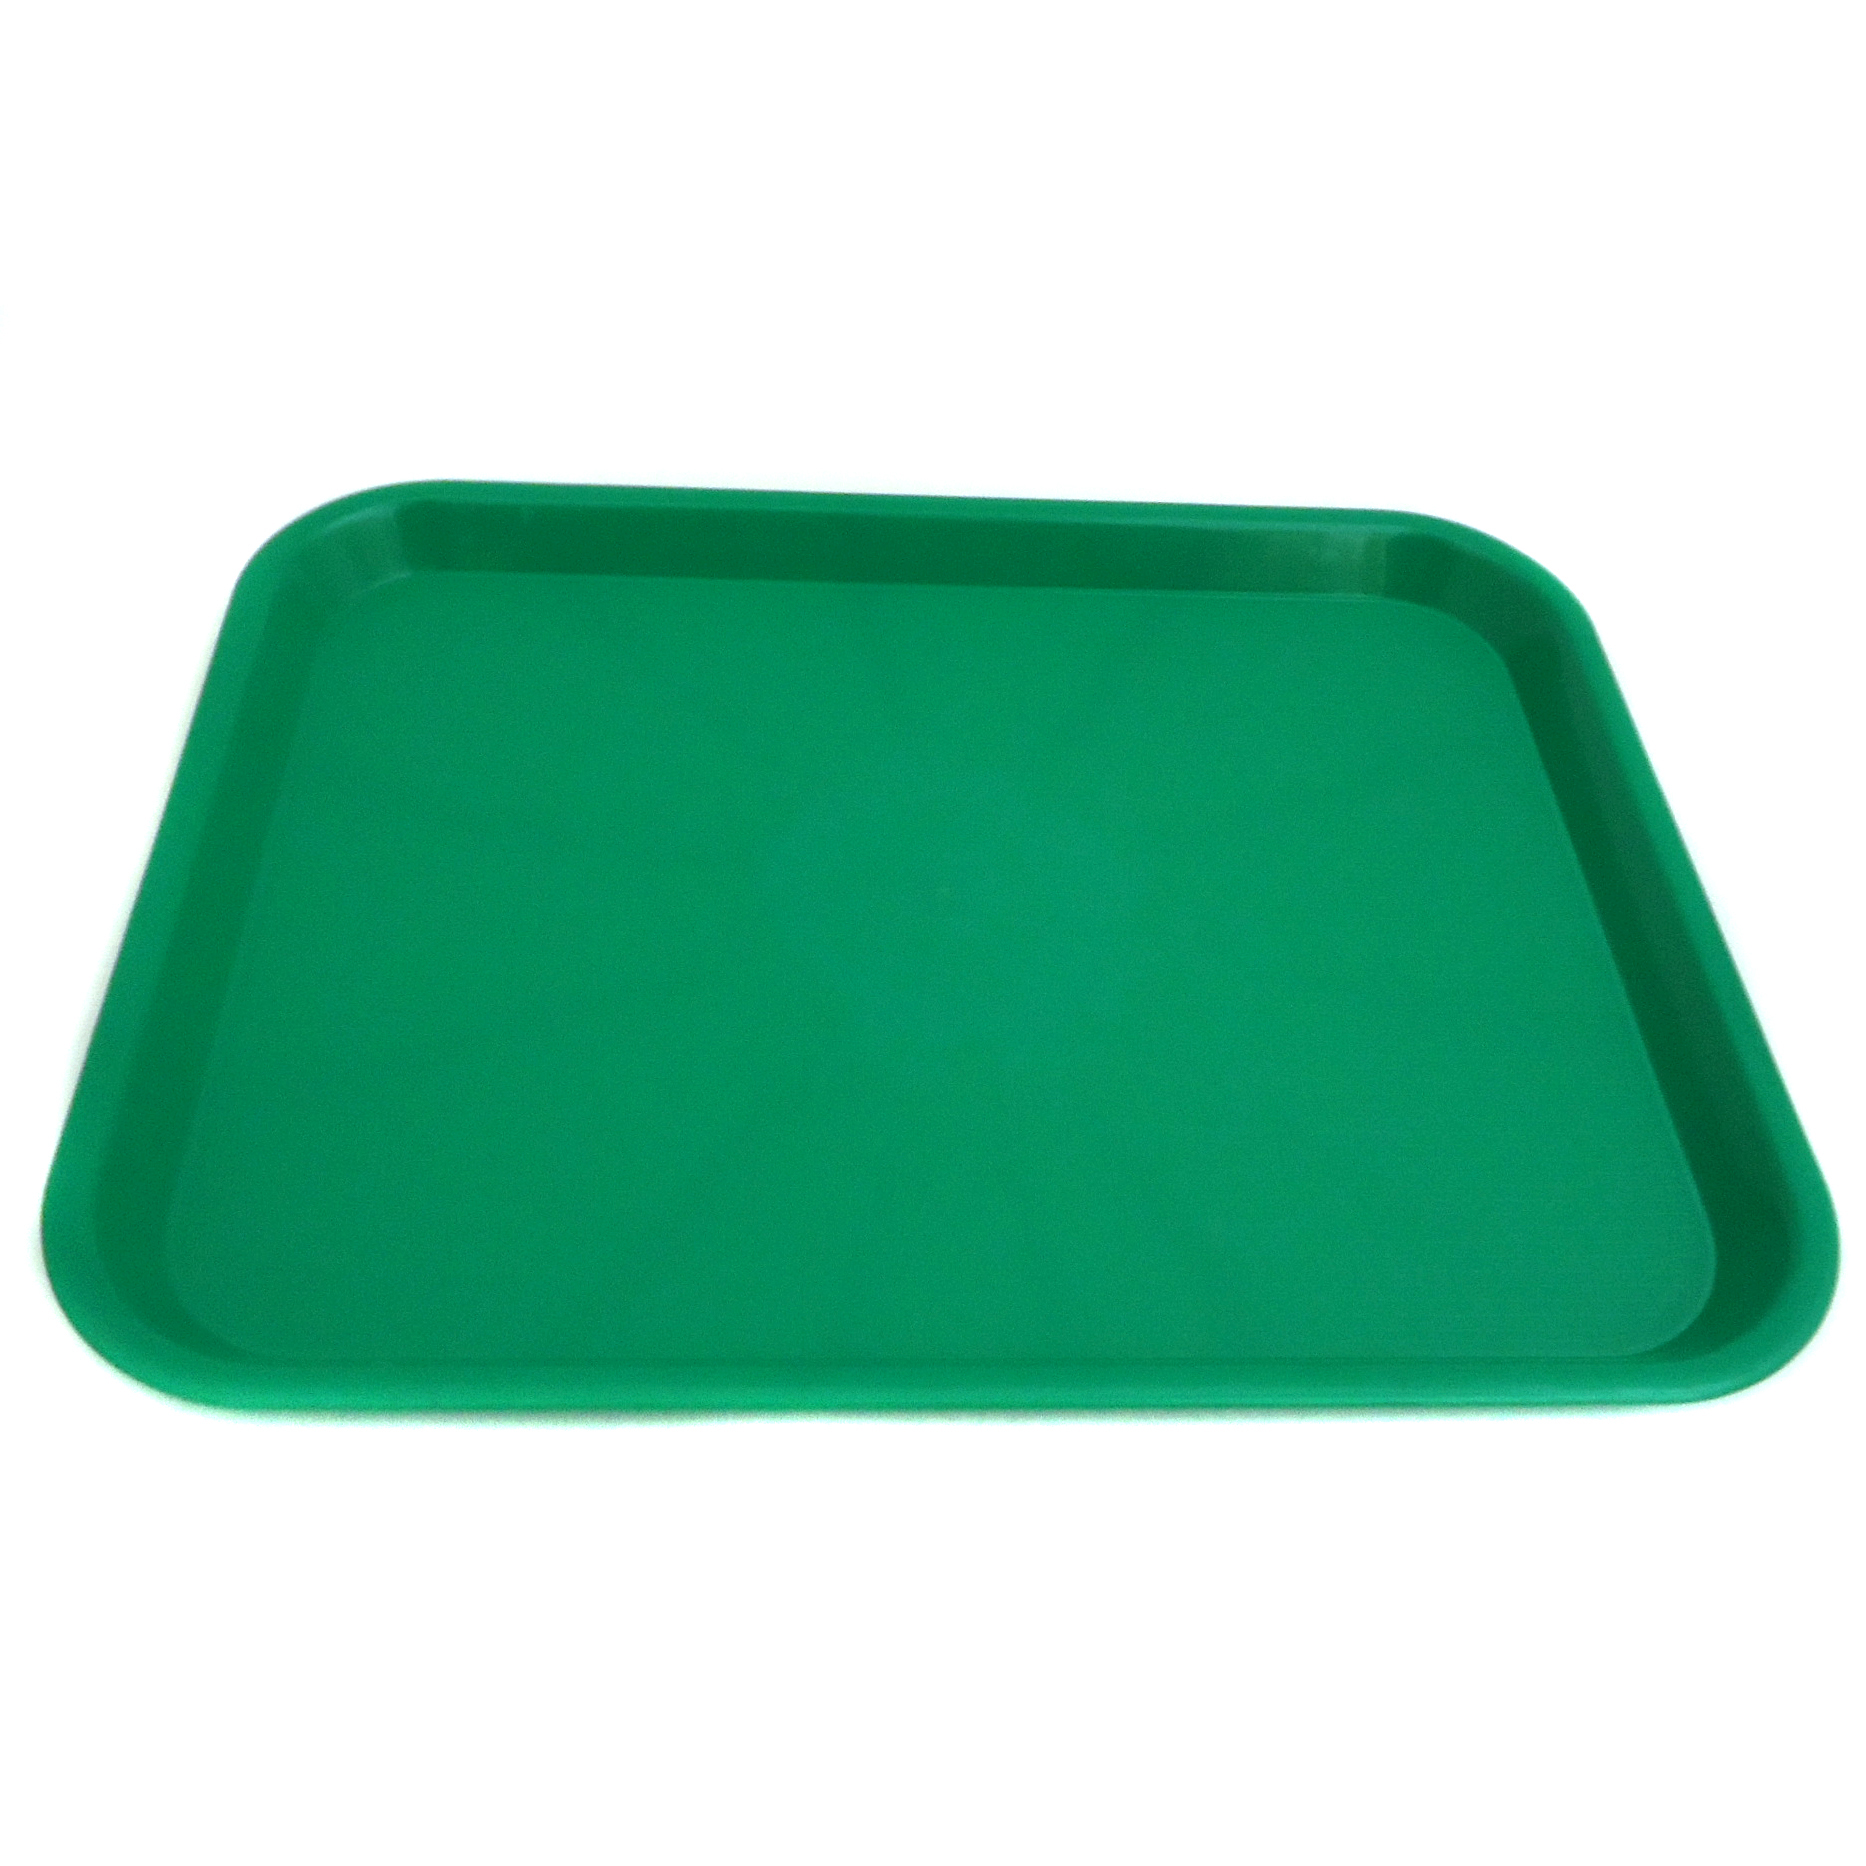 Bertoli FAST FOOD (350x270mm) Δίσκος Σερβιρίσματος Ορθογώνιος Πλαστικός Χρώματος επαγγελματικός εξοπλισμός   επαγγελματικά σκεύη είδη σερβιρίσματος   εξαρτήματα